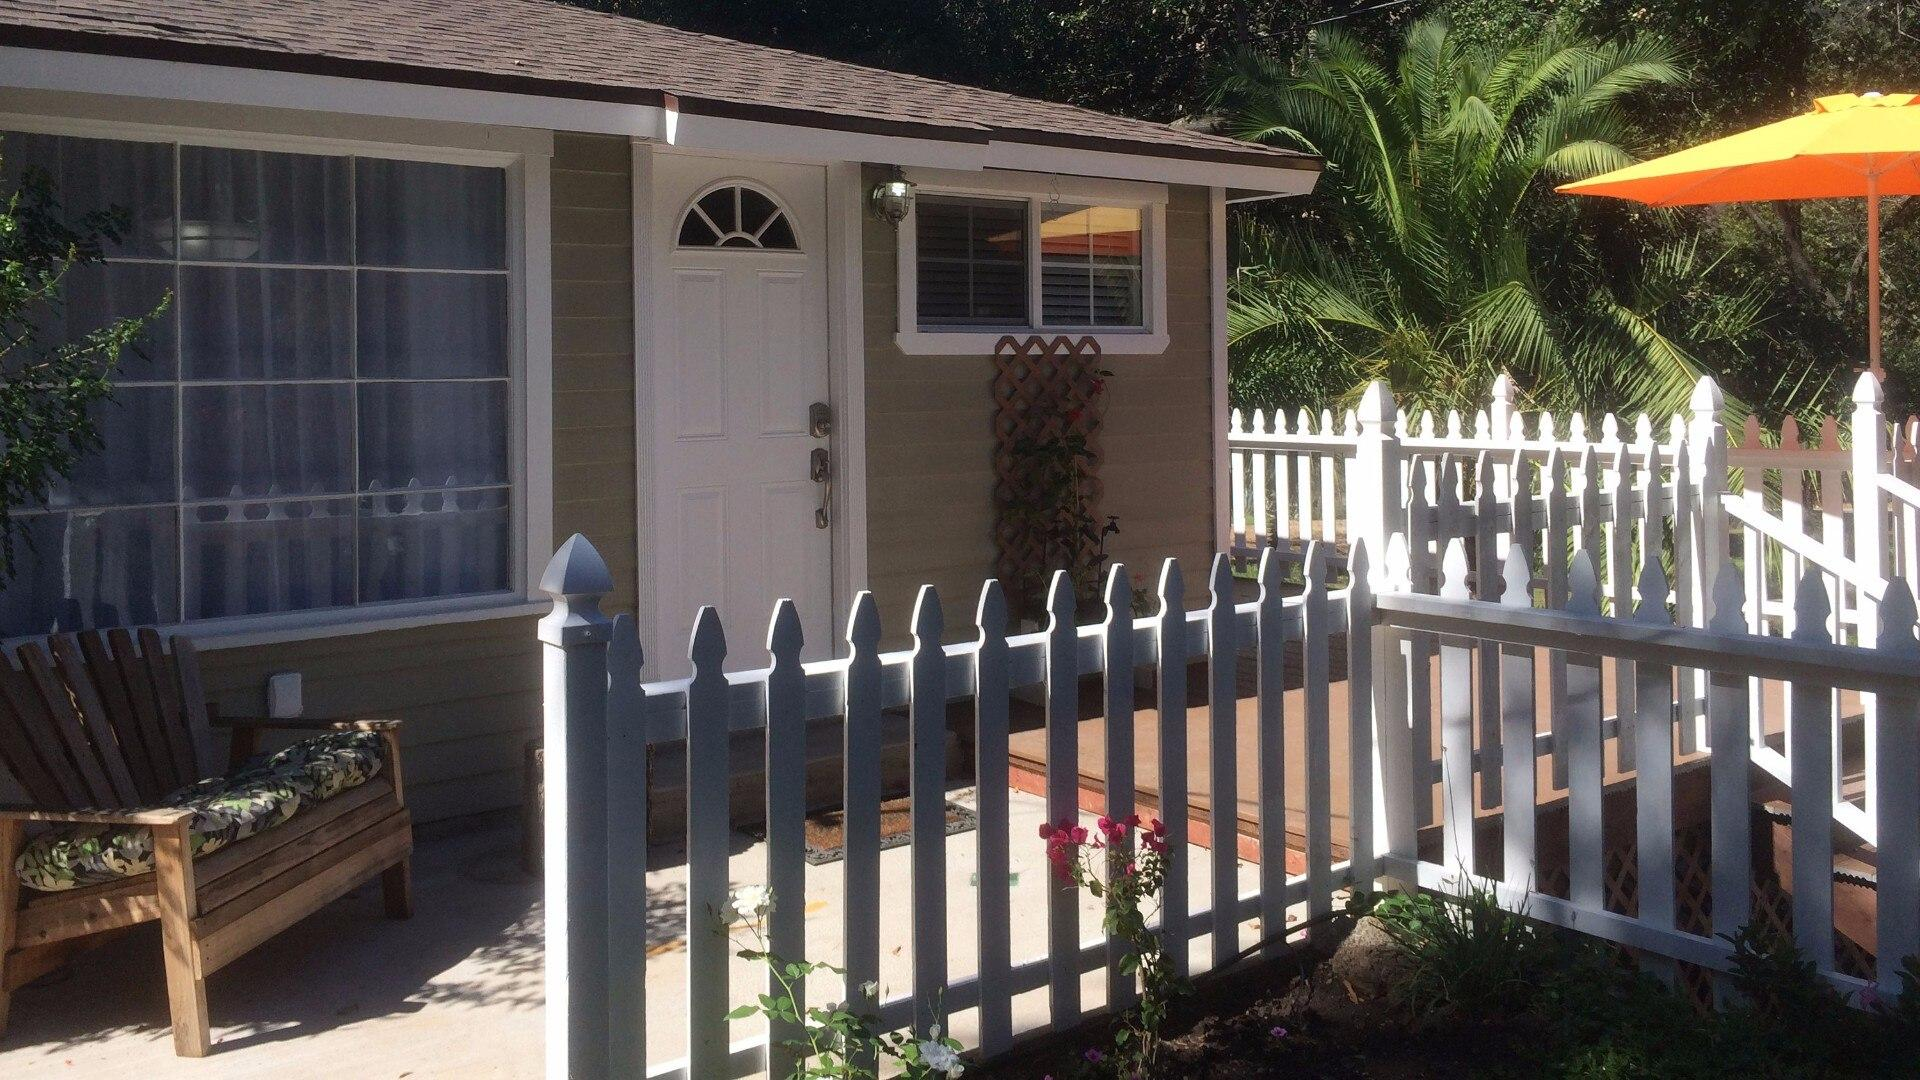 Cielo Tiny House - Piccole case per vivere...